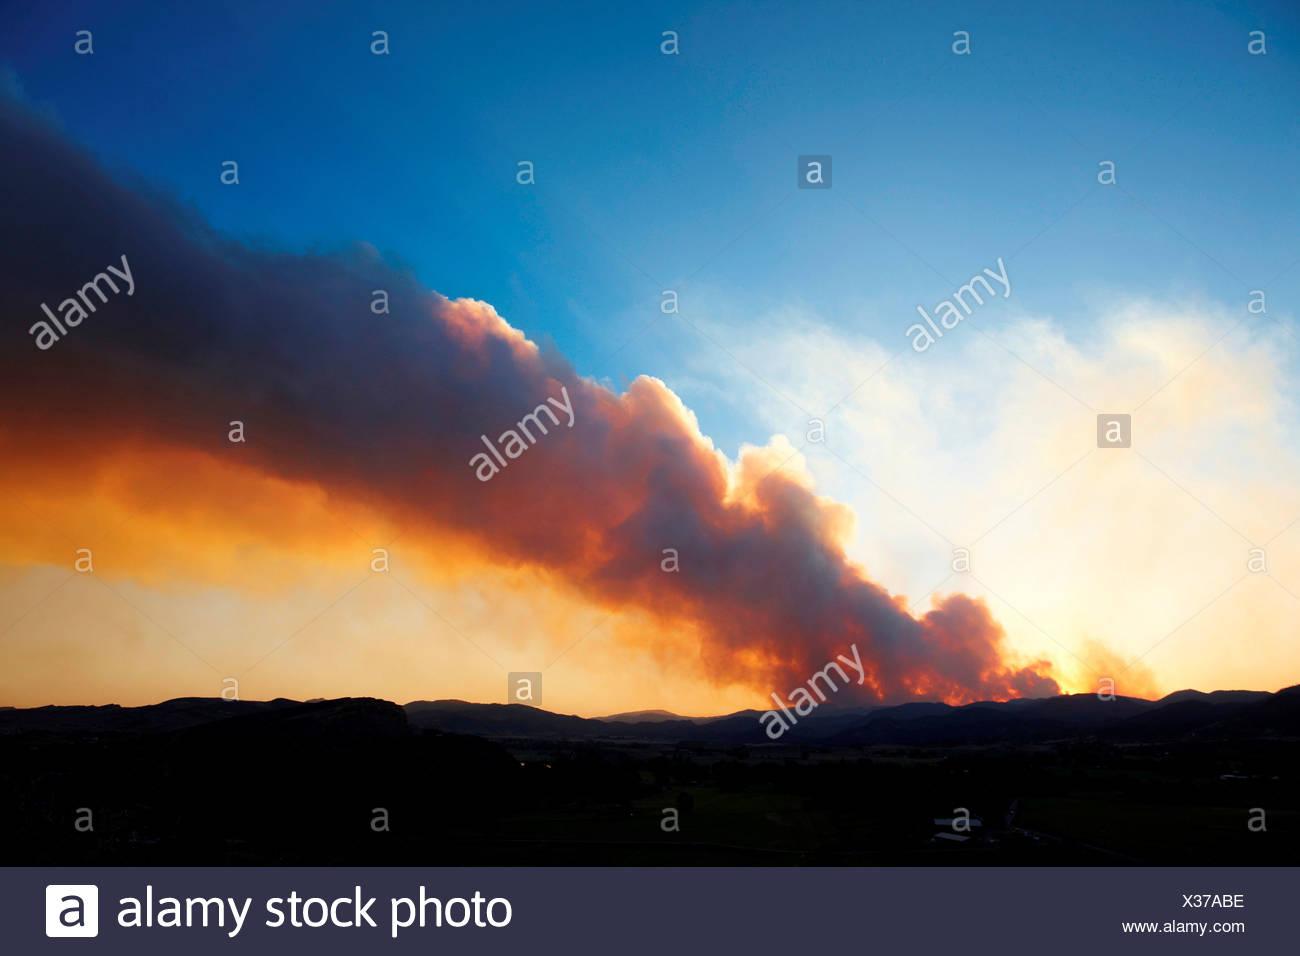 Plume of smoke rises from raging mountain wildfire, Colorado, USA - Stock Image